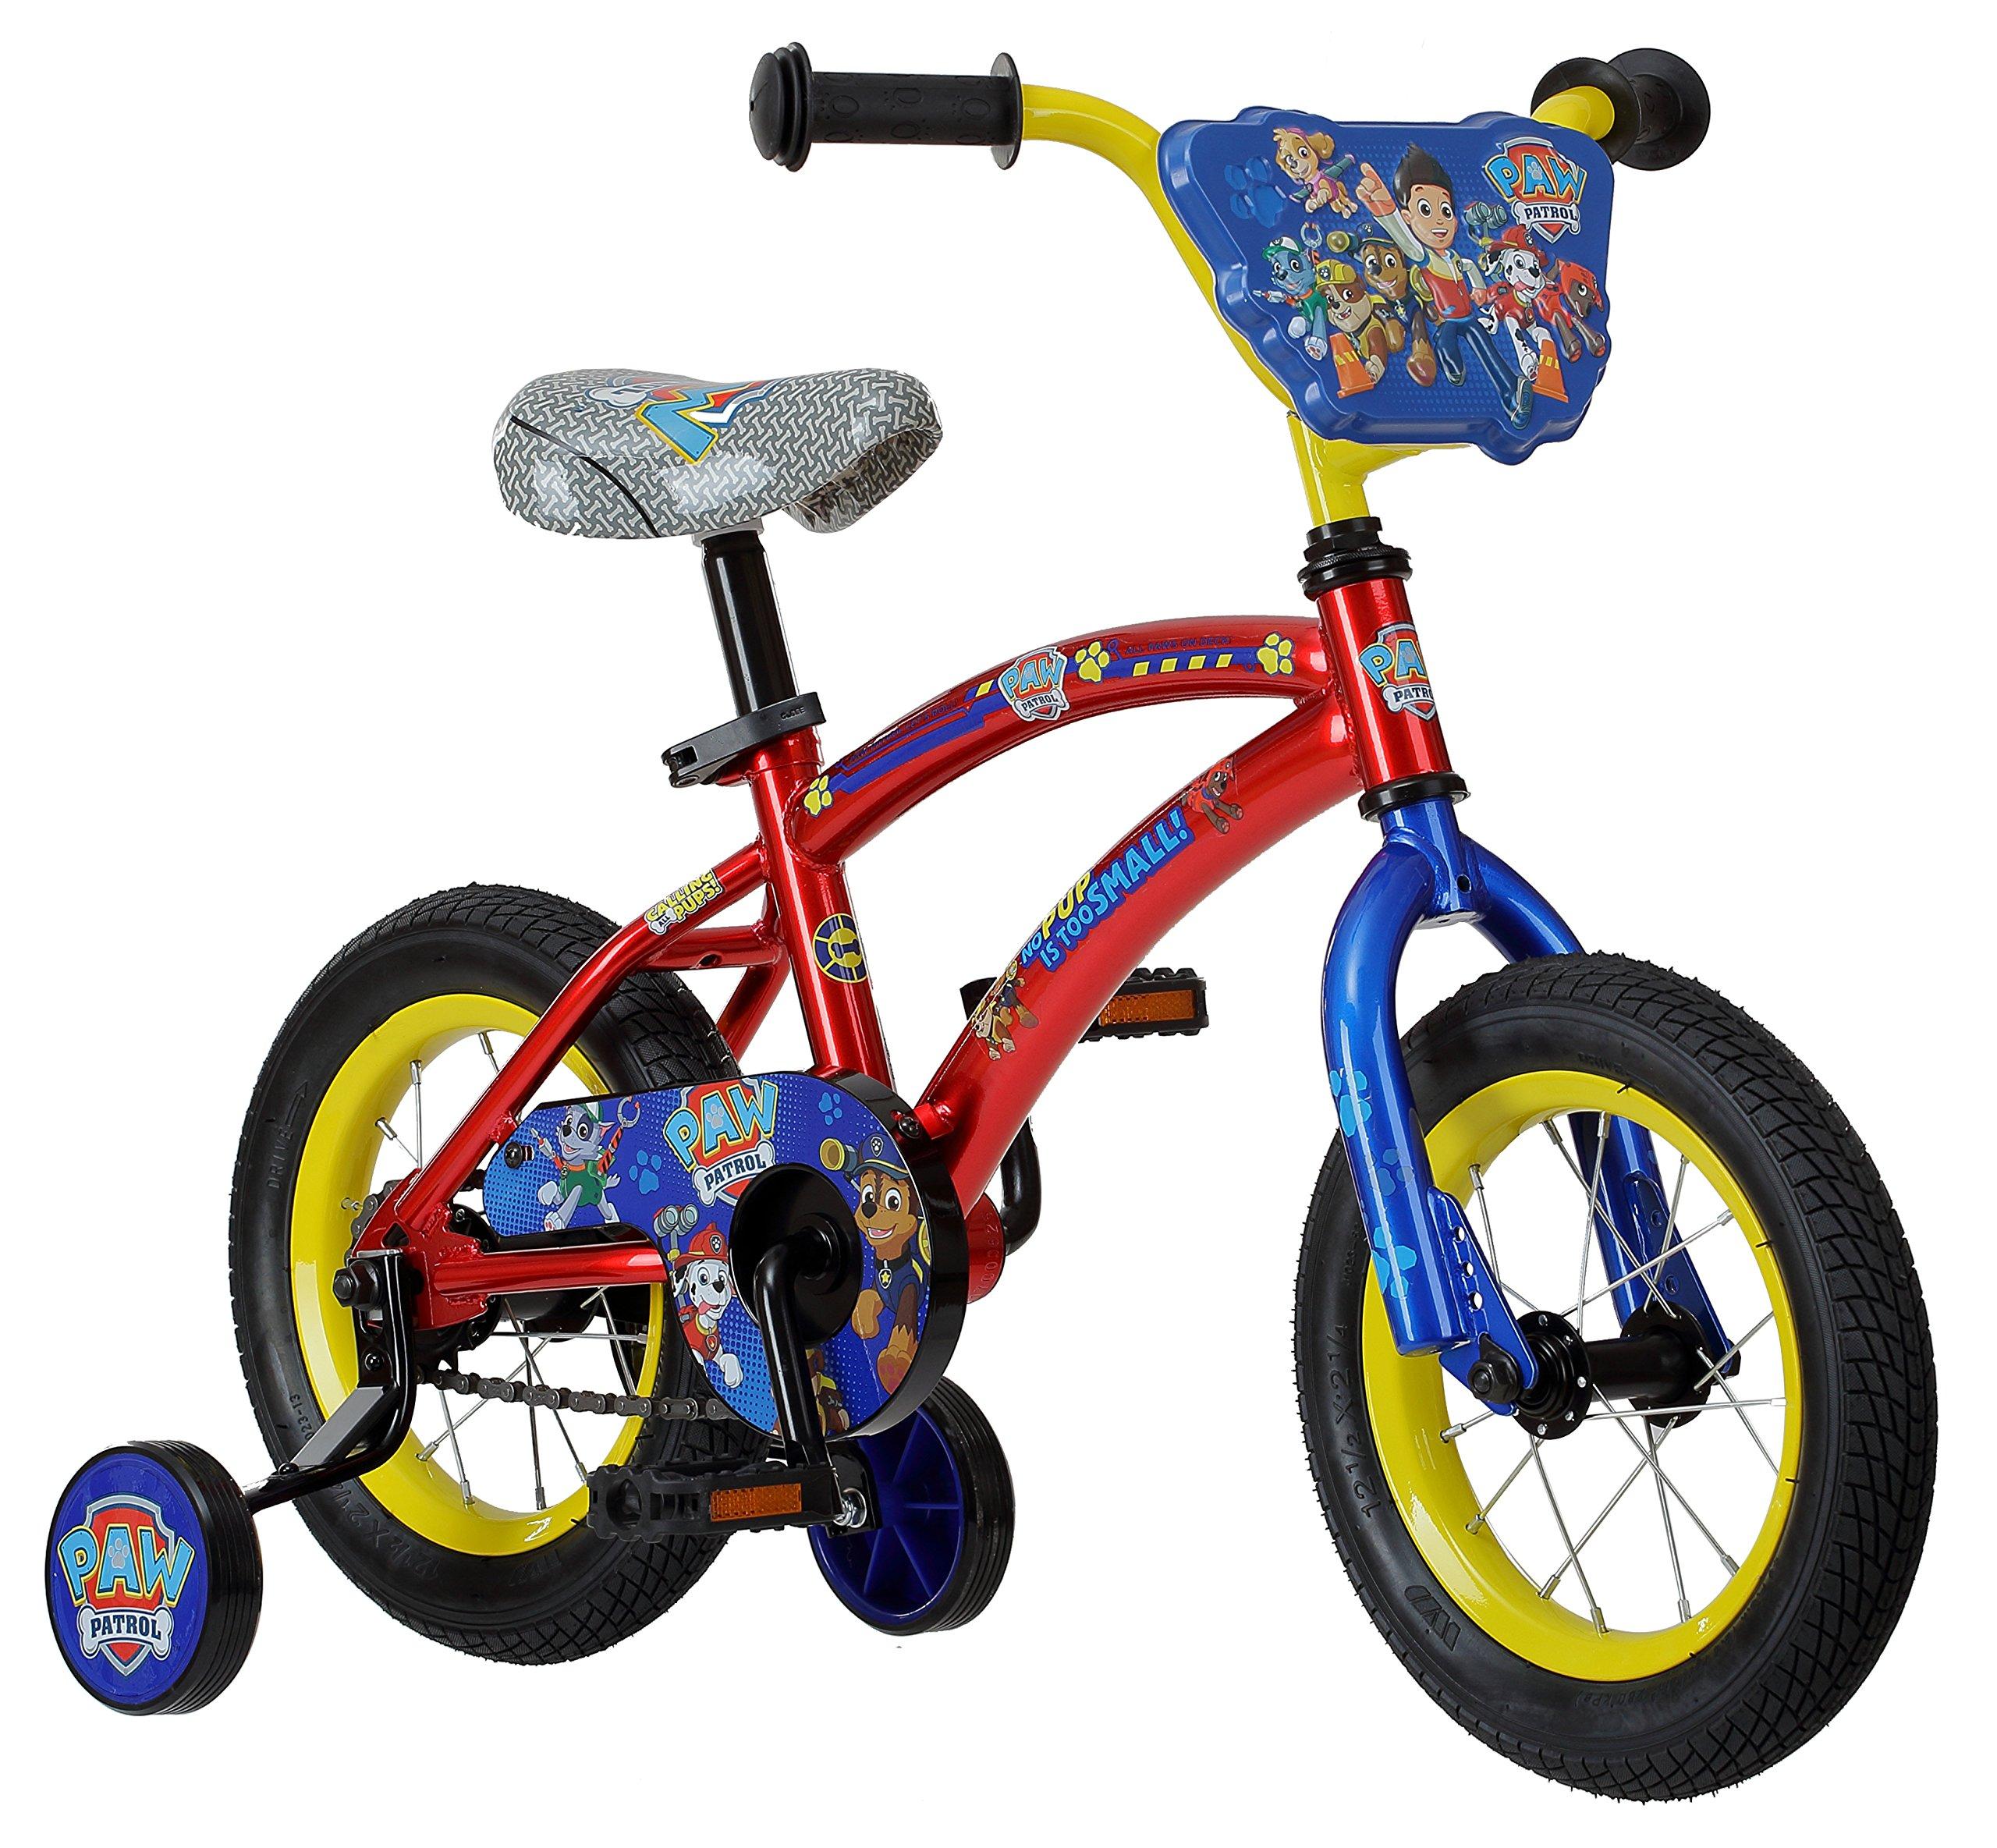 Nickelodeon Paw Patrol 12'' Bicycle